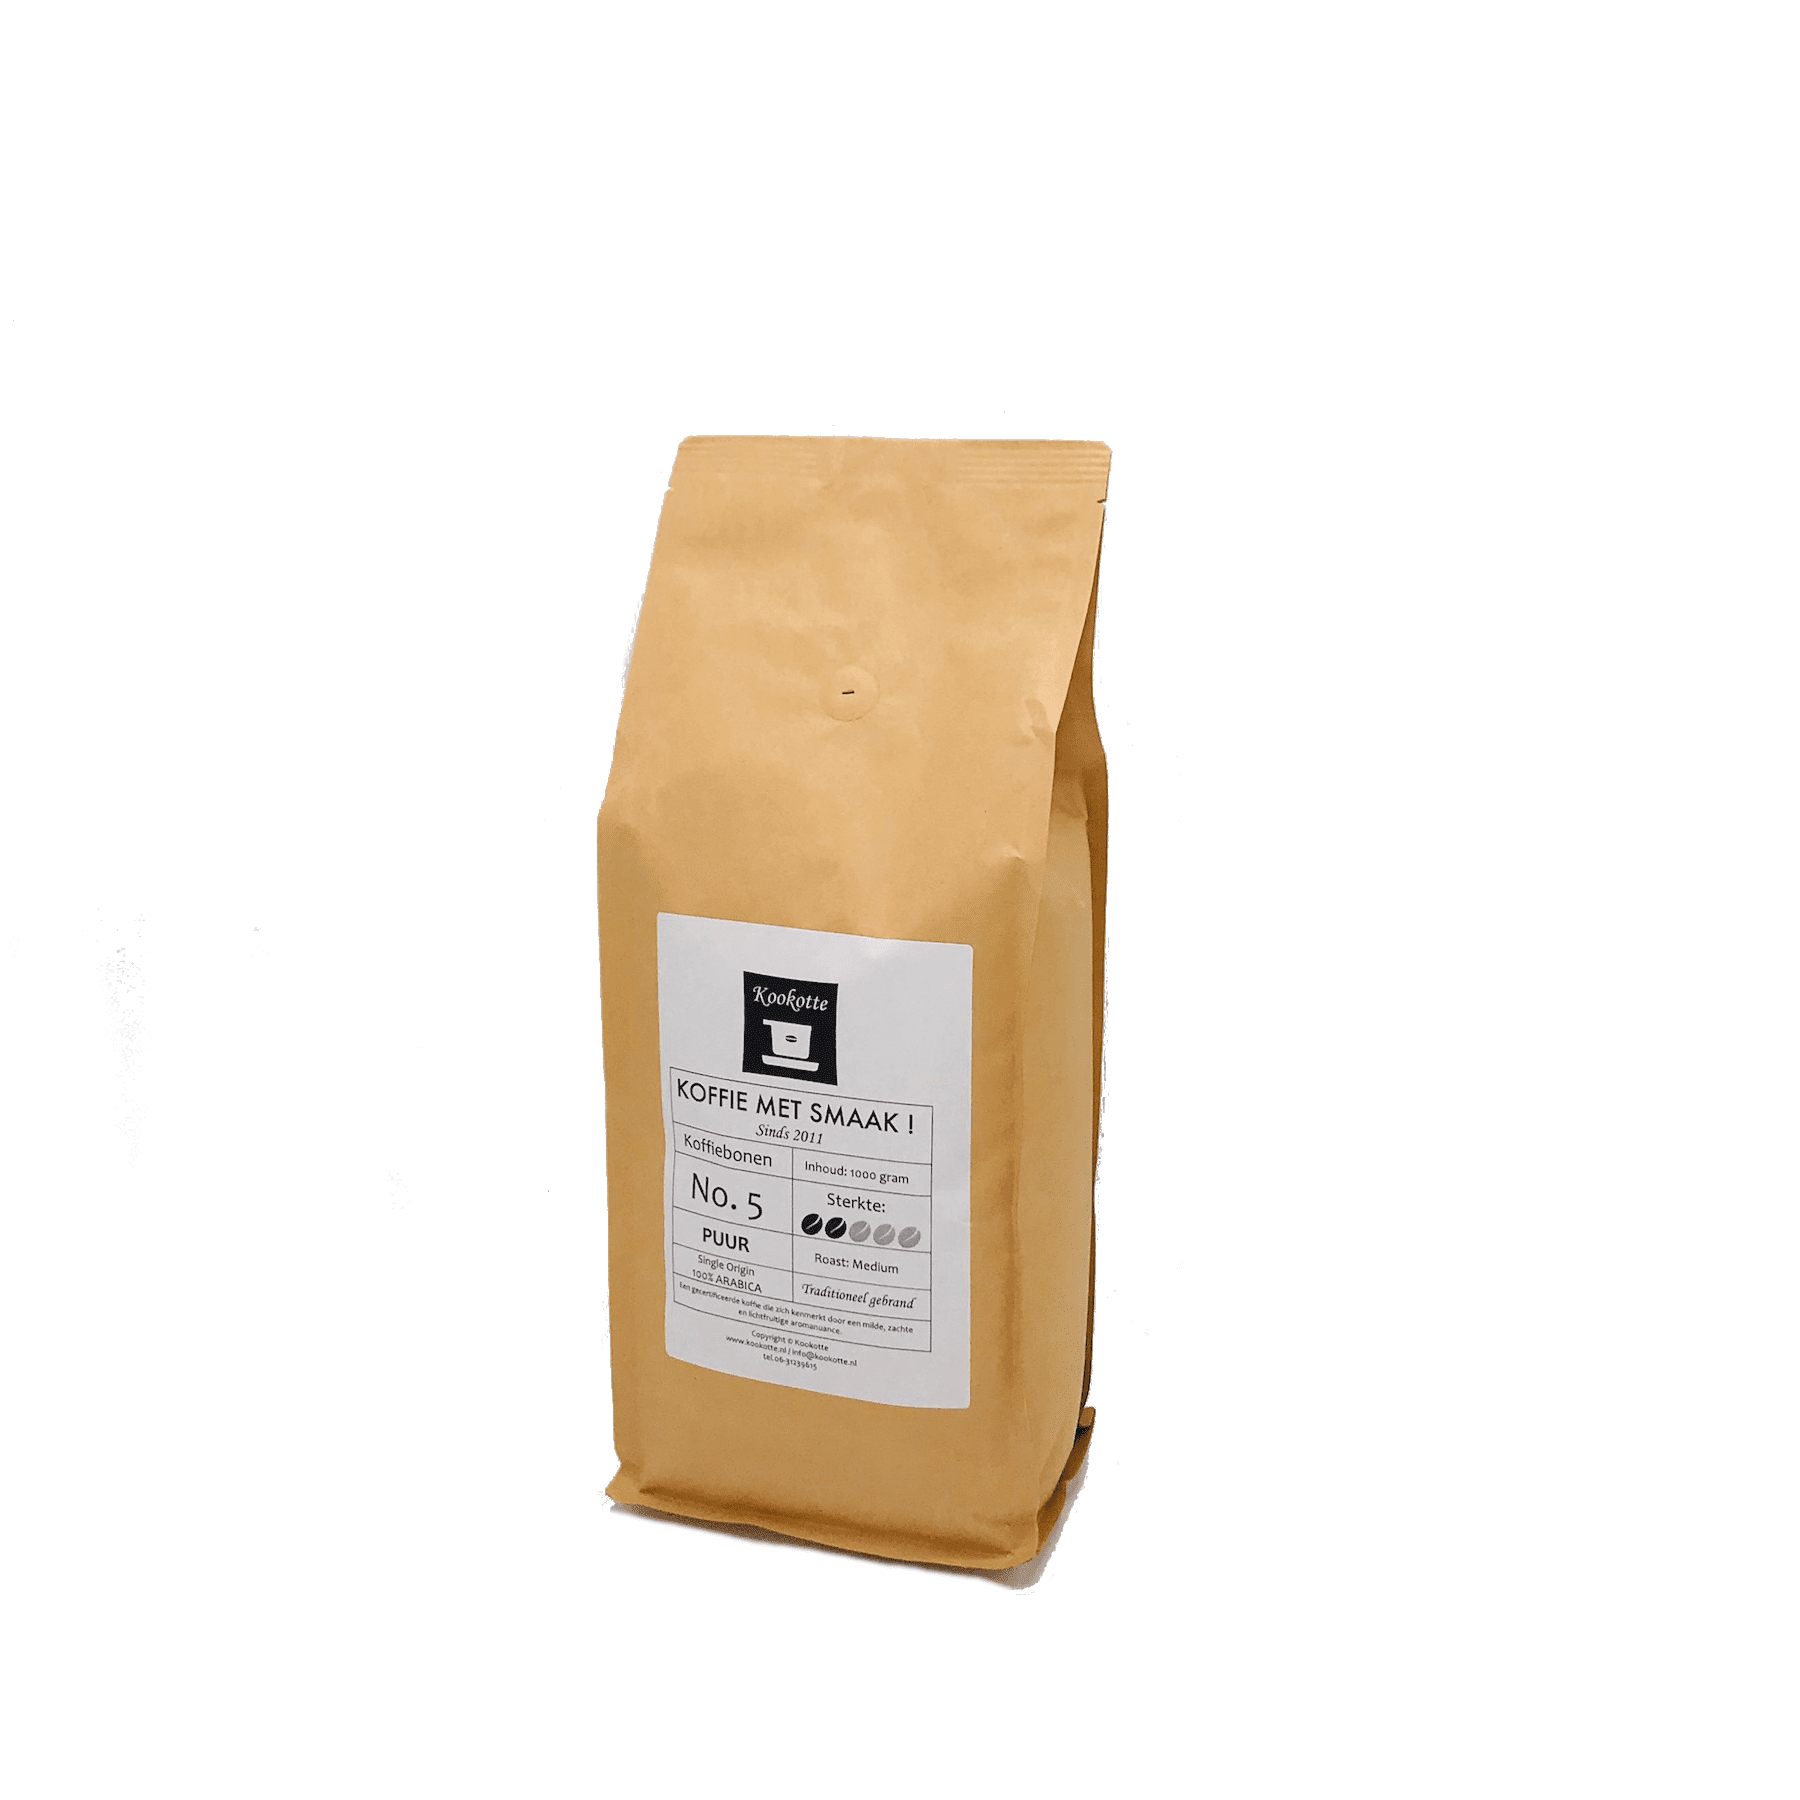 Koffiebonen No.5